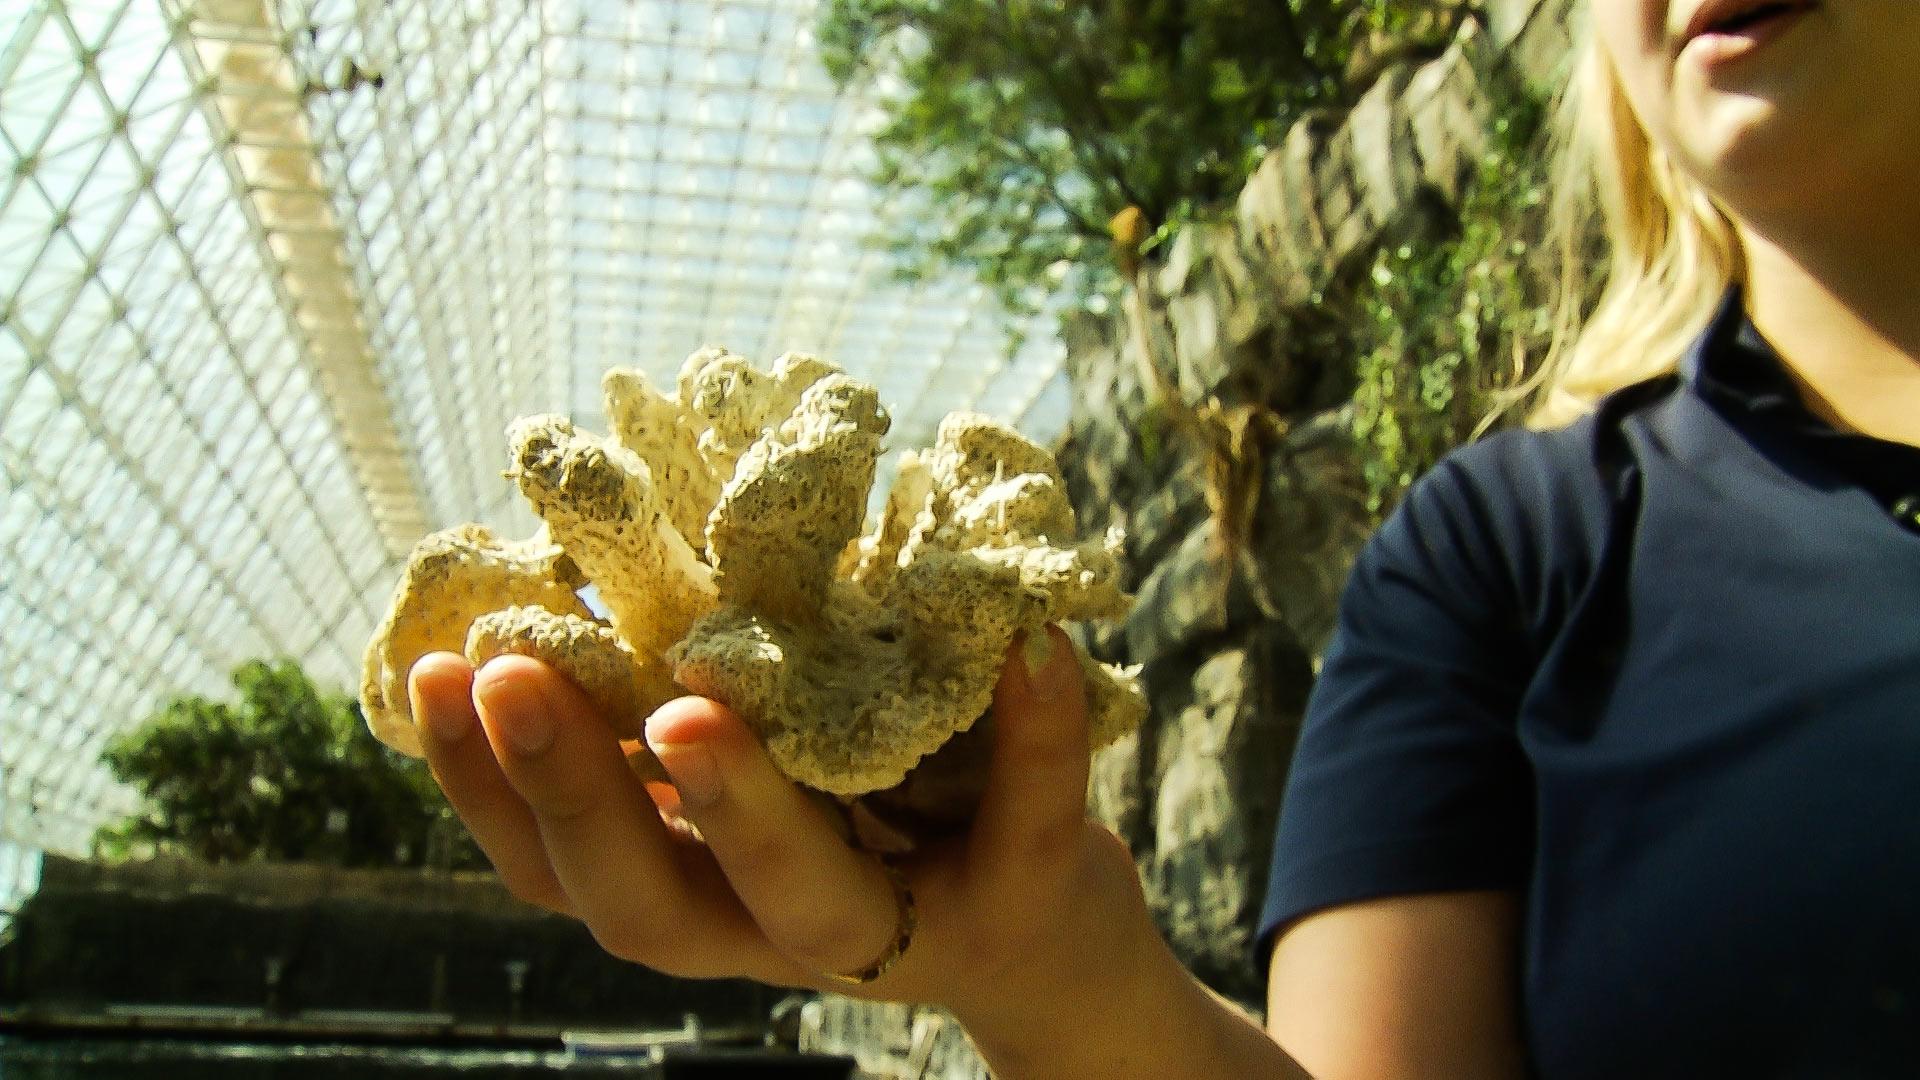 Coral at Biosphere 2.